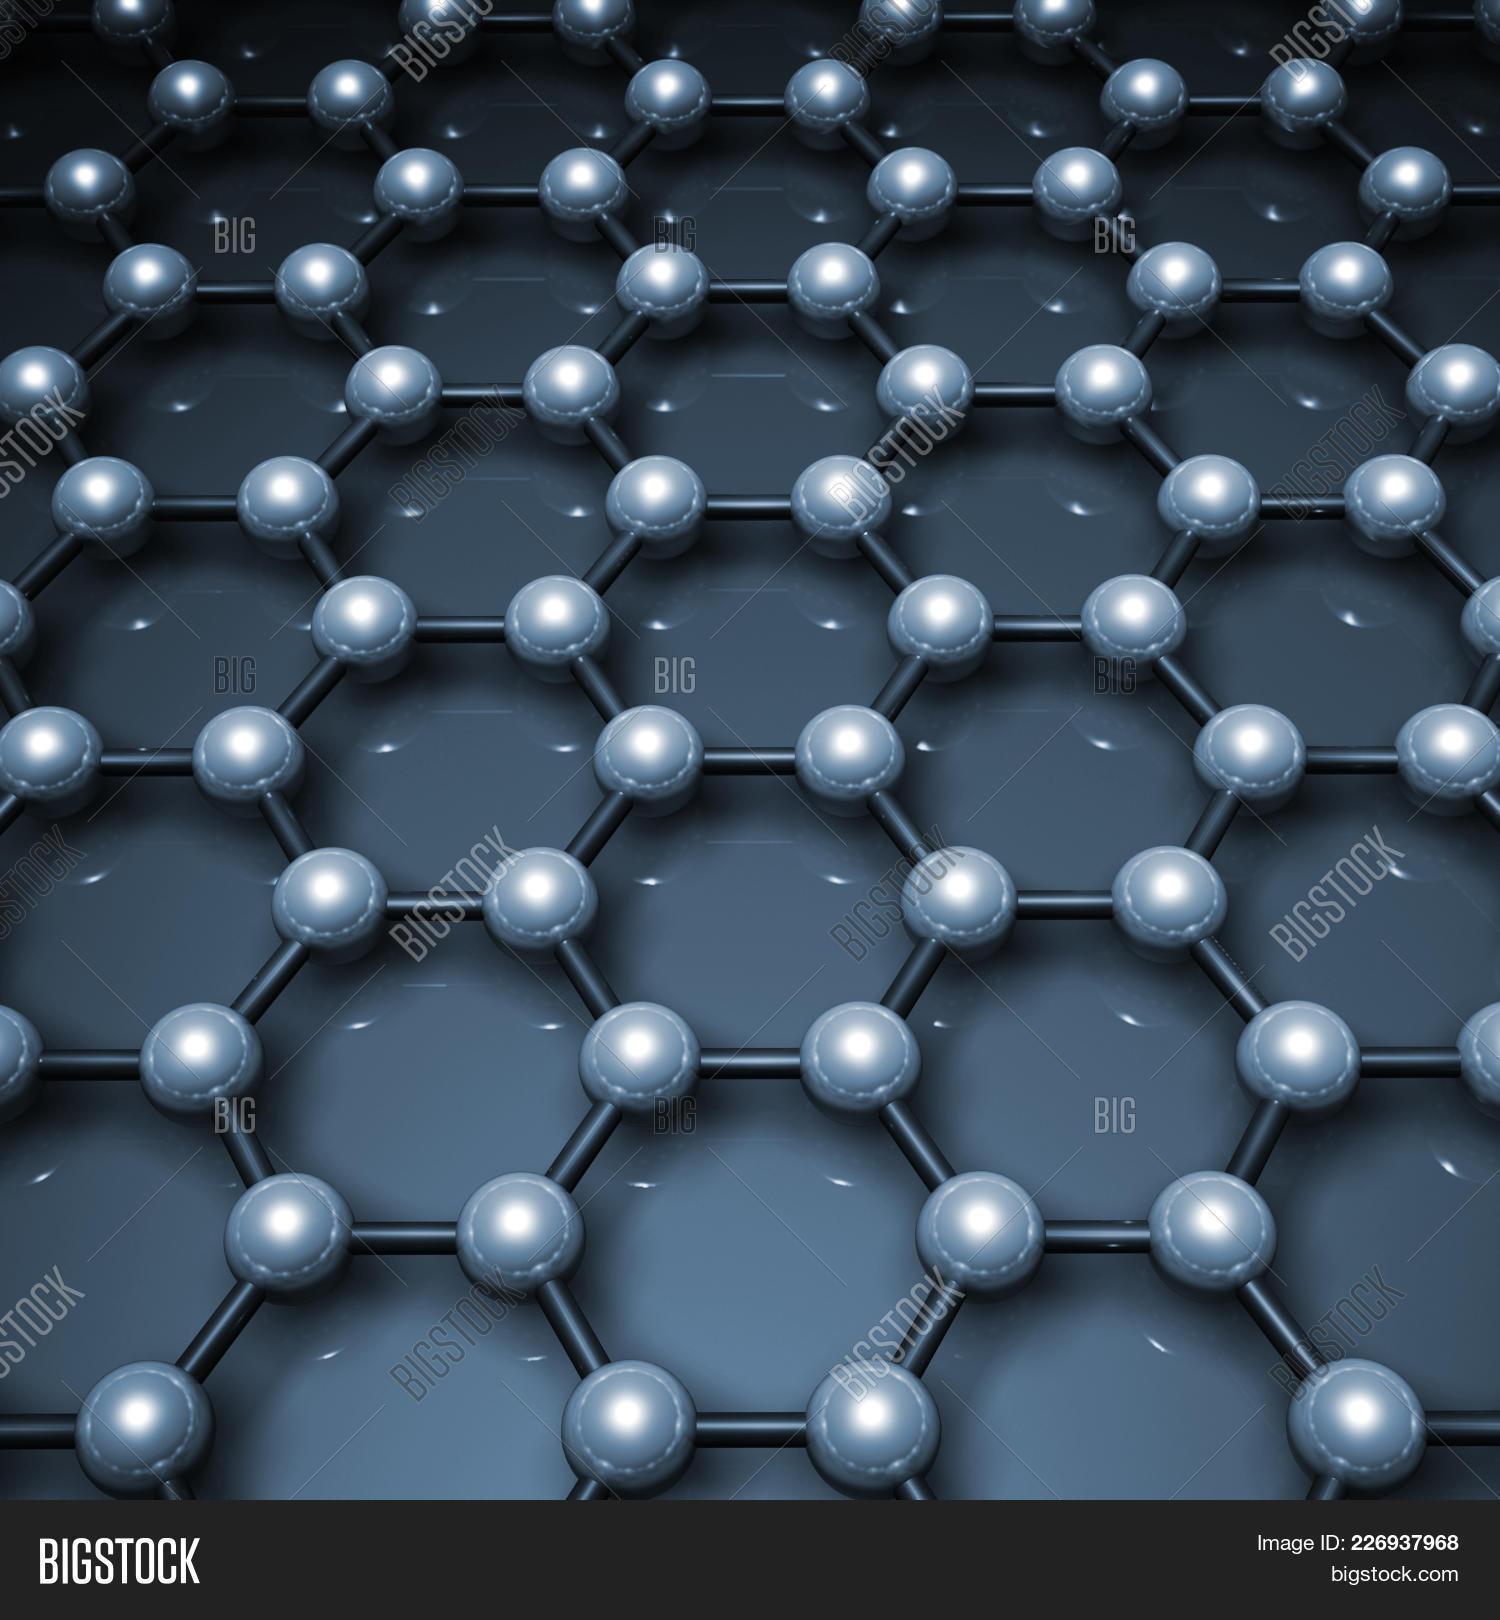 Graphene Layer Image & Photo (Free Trial) | Bigstock